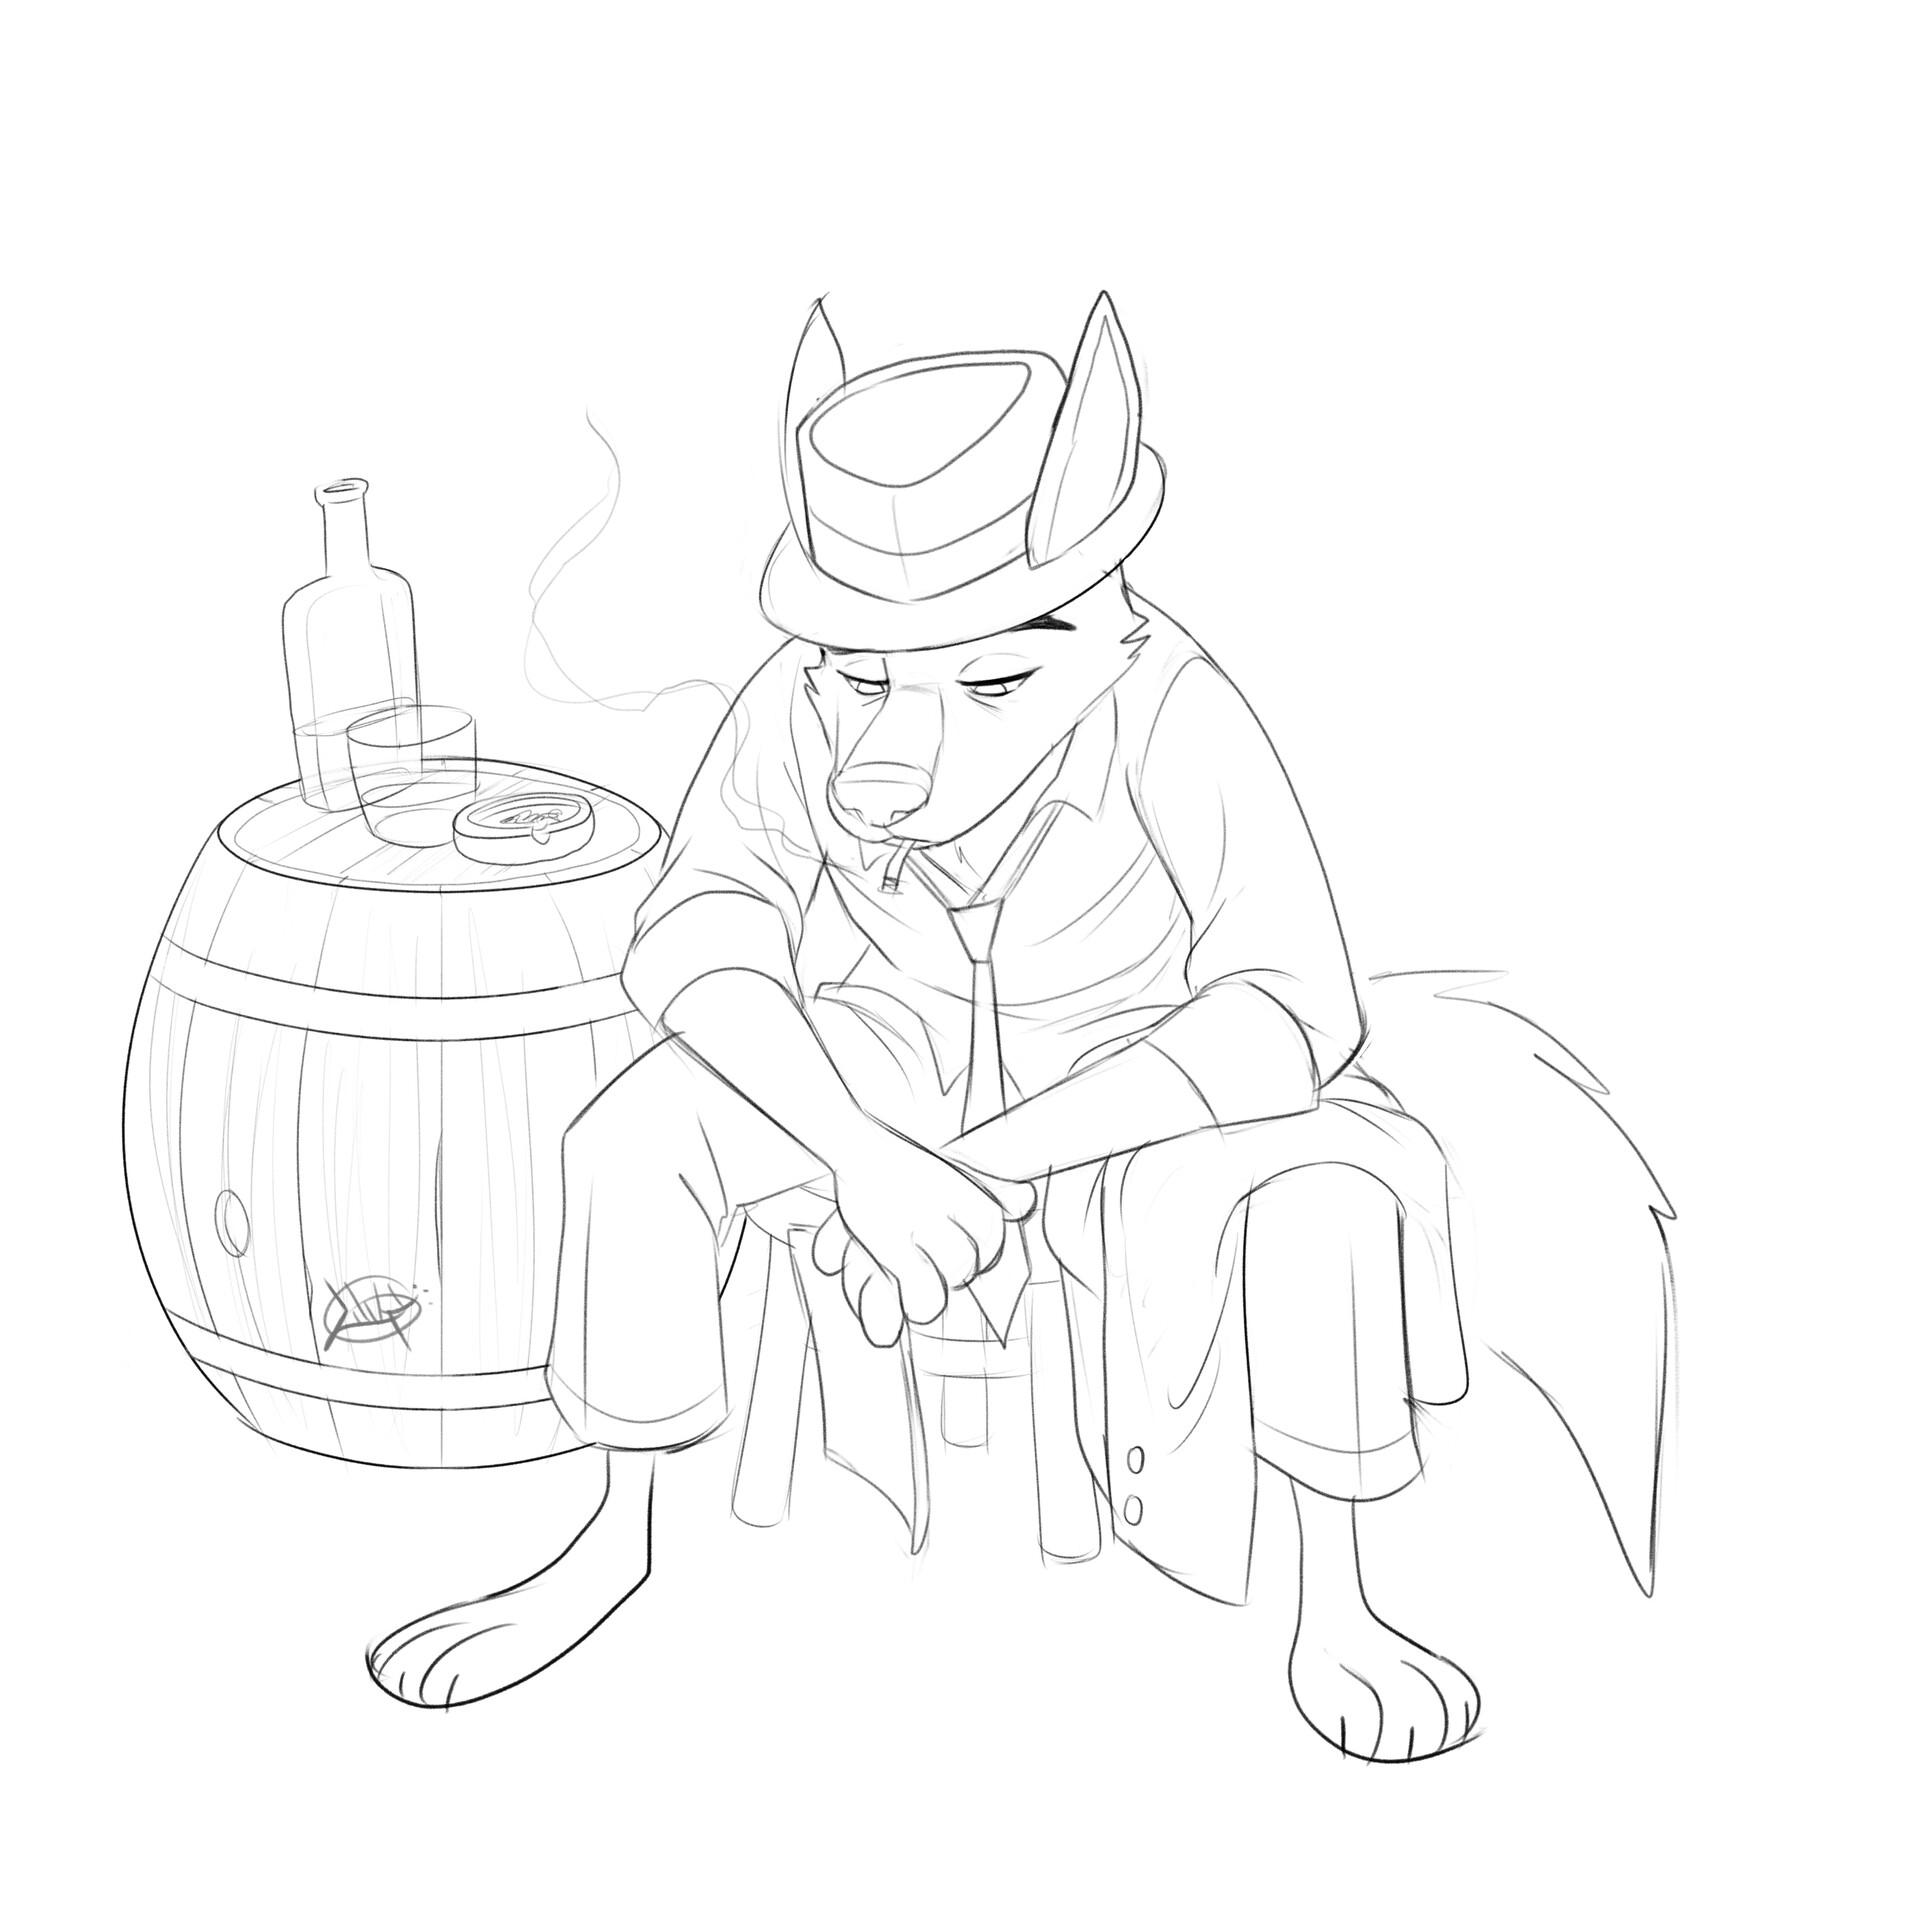 Luigi lucarelli contemplating wolf clean lines